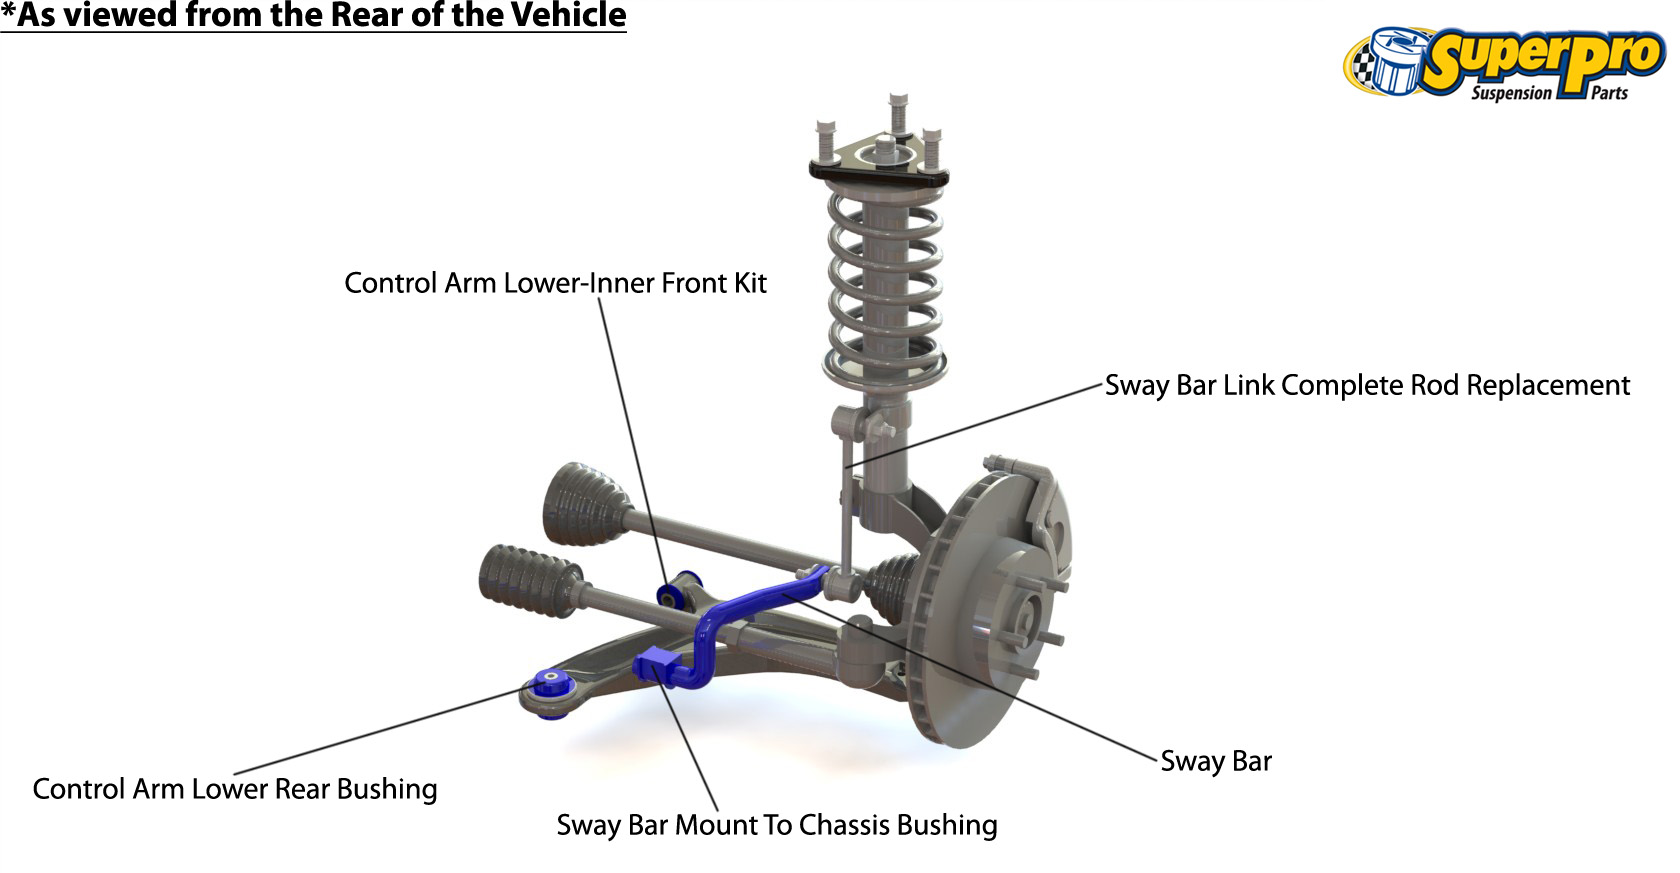 Superpro Suspension Parts And Poly Bushings For Subaru